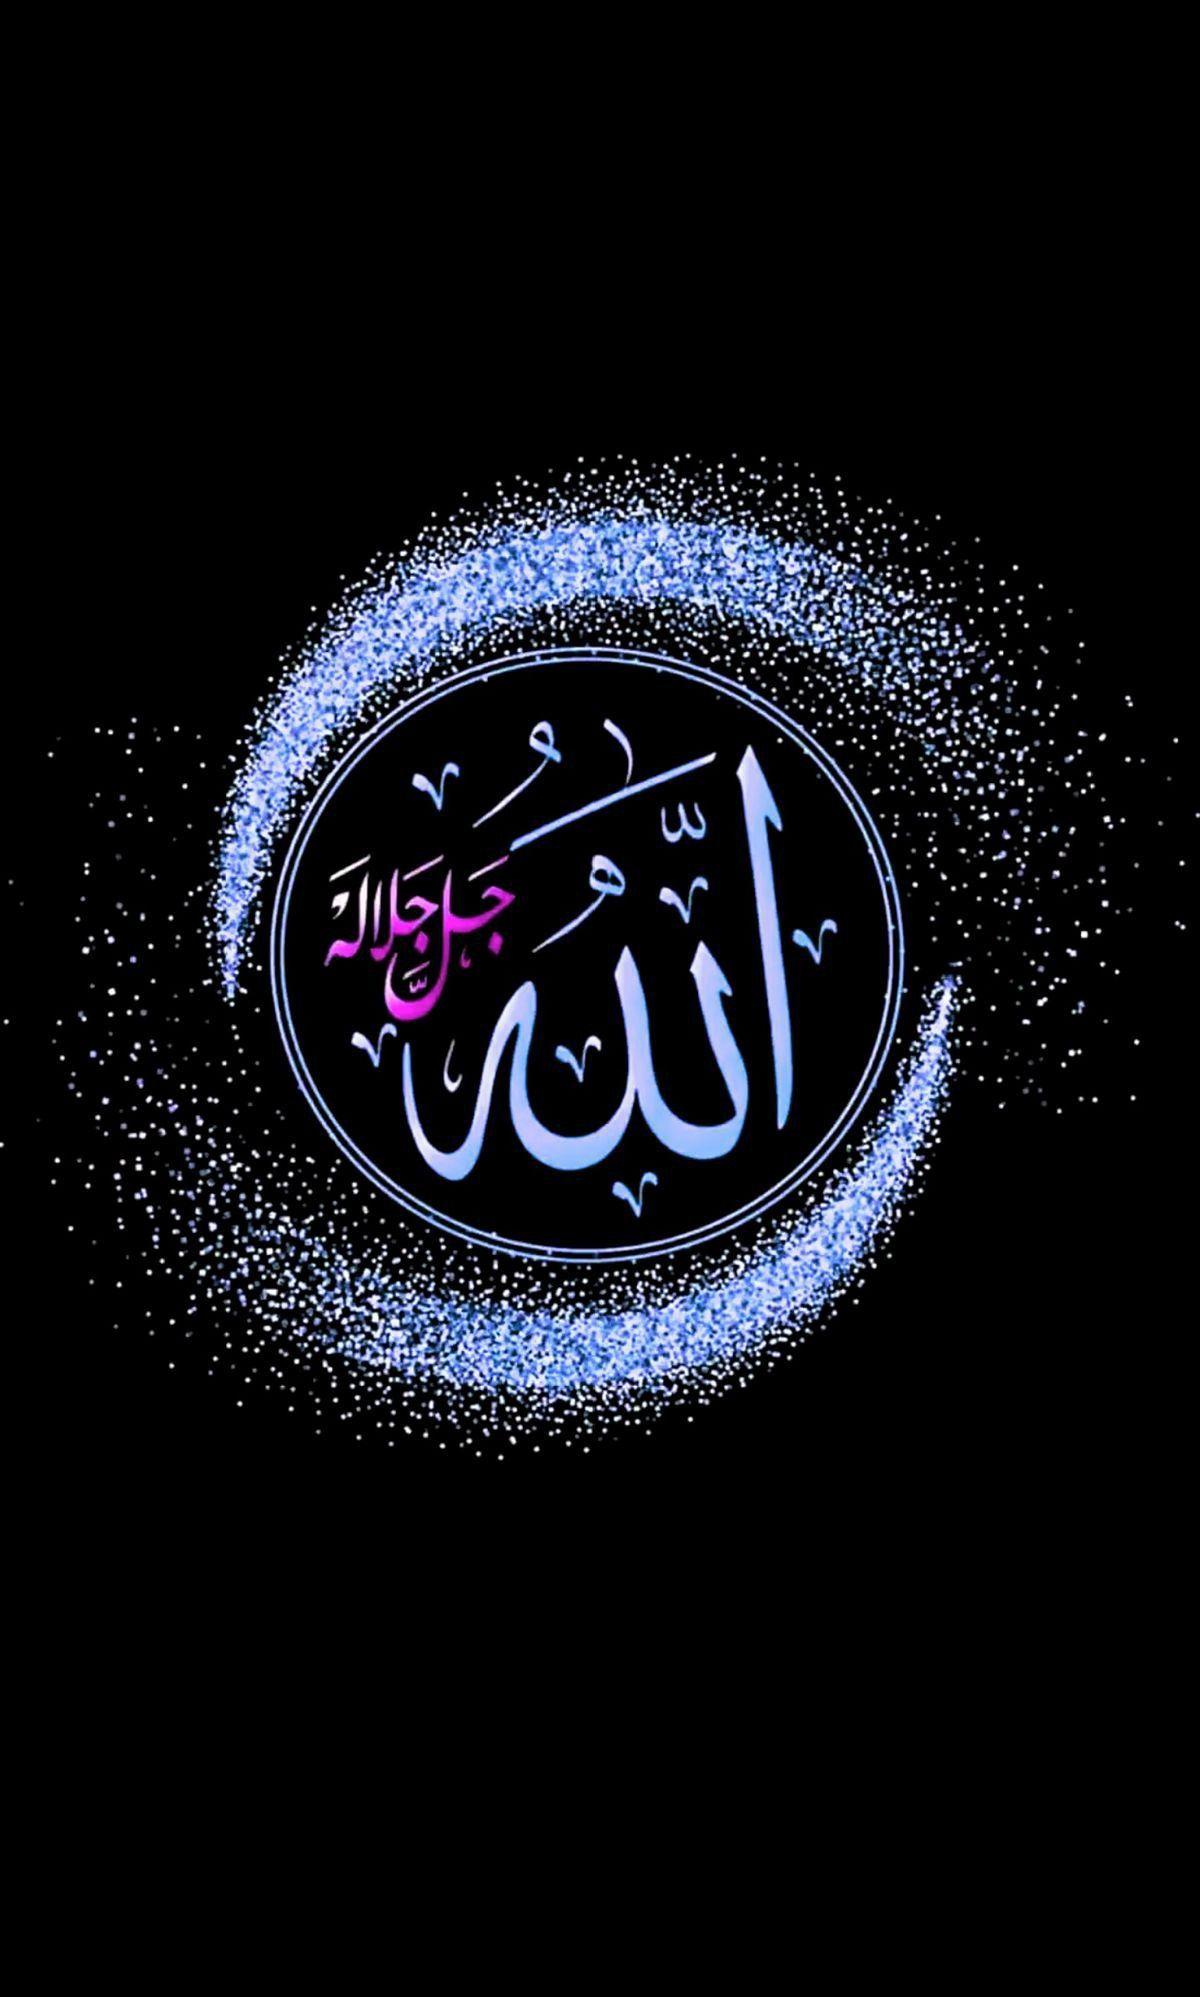 Pin By Ssmusaev On Duvar Kagitlari Walpapers Allah Wallpaper Kaligrafi Allah Allah Calligraphy